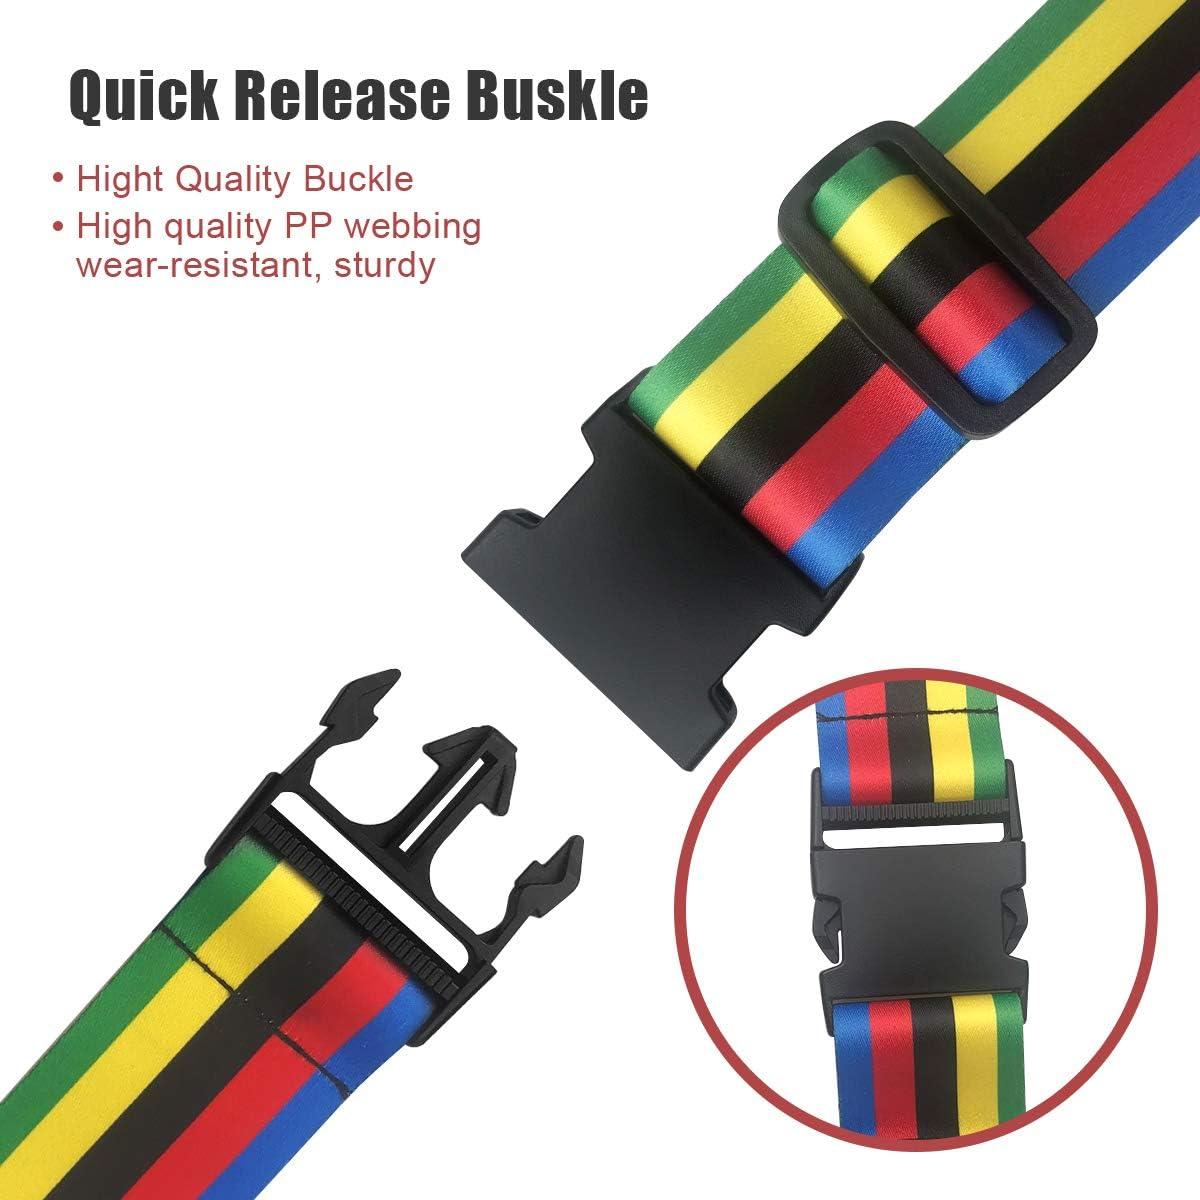 YDY 2 PCS Luggage Straps Suitcase Belts Travel Accessories Bag Straps Adjustable Suitcase Travel Belt Multicolor